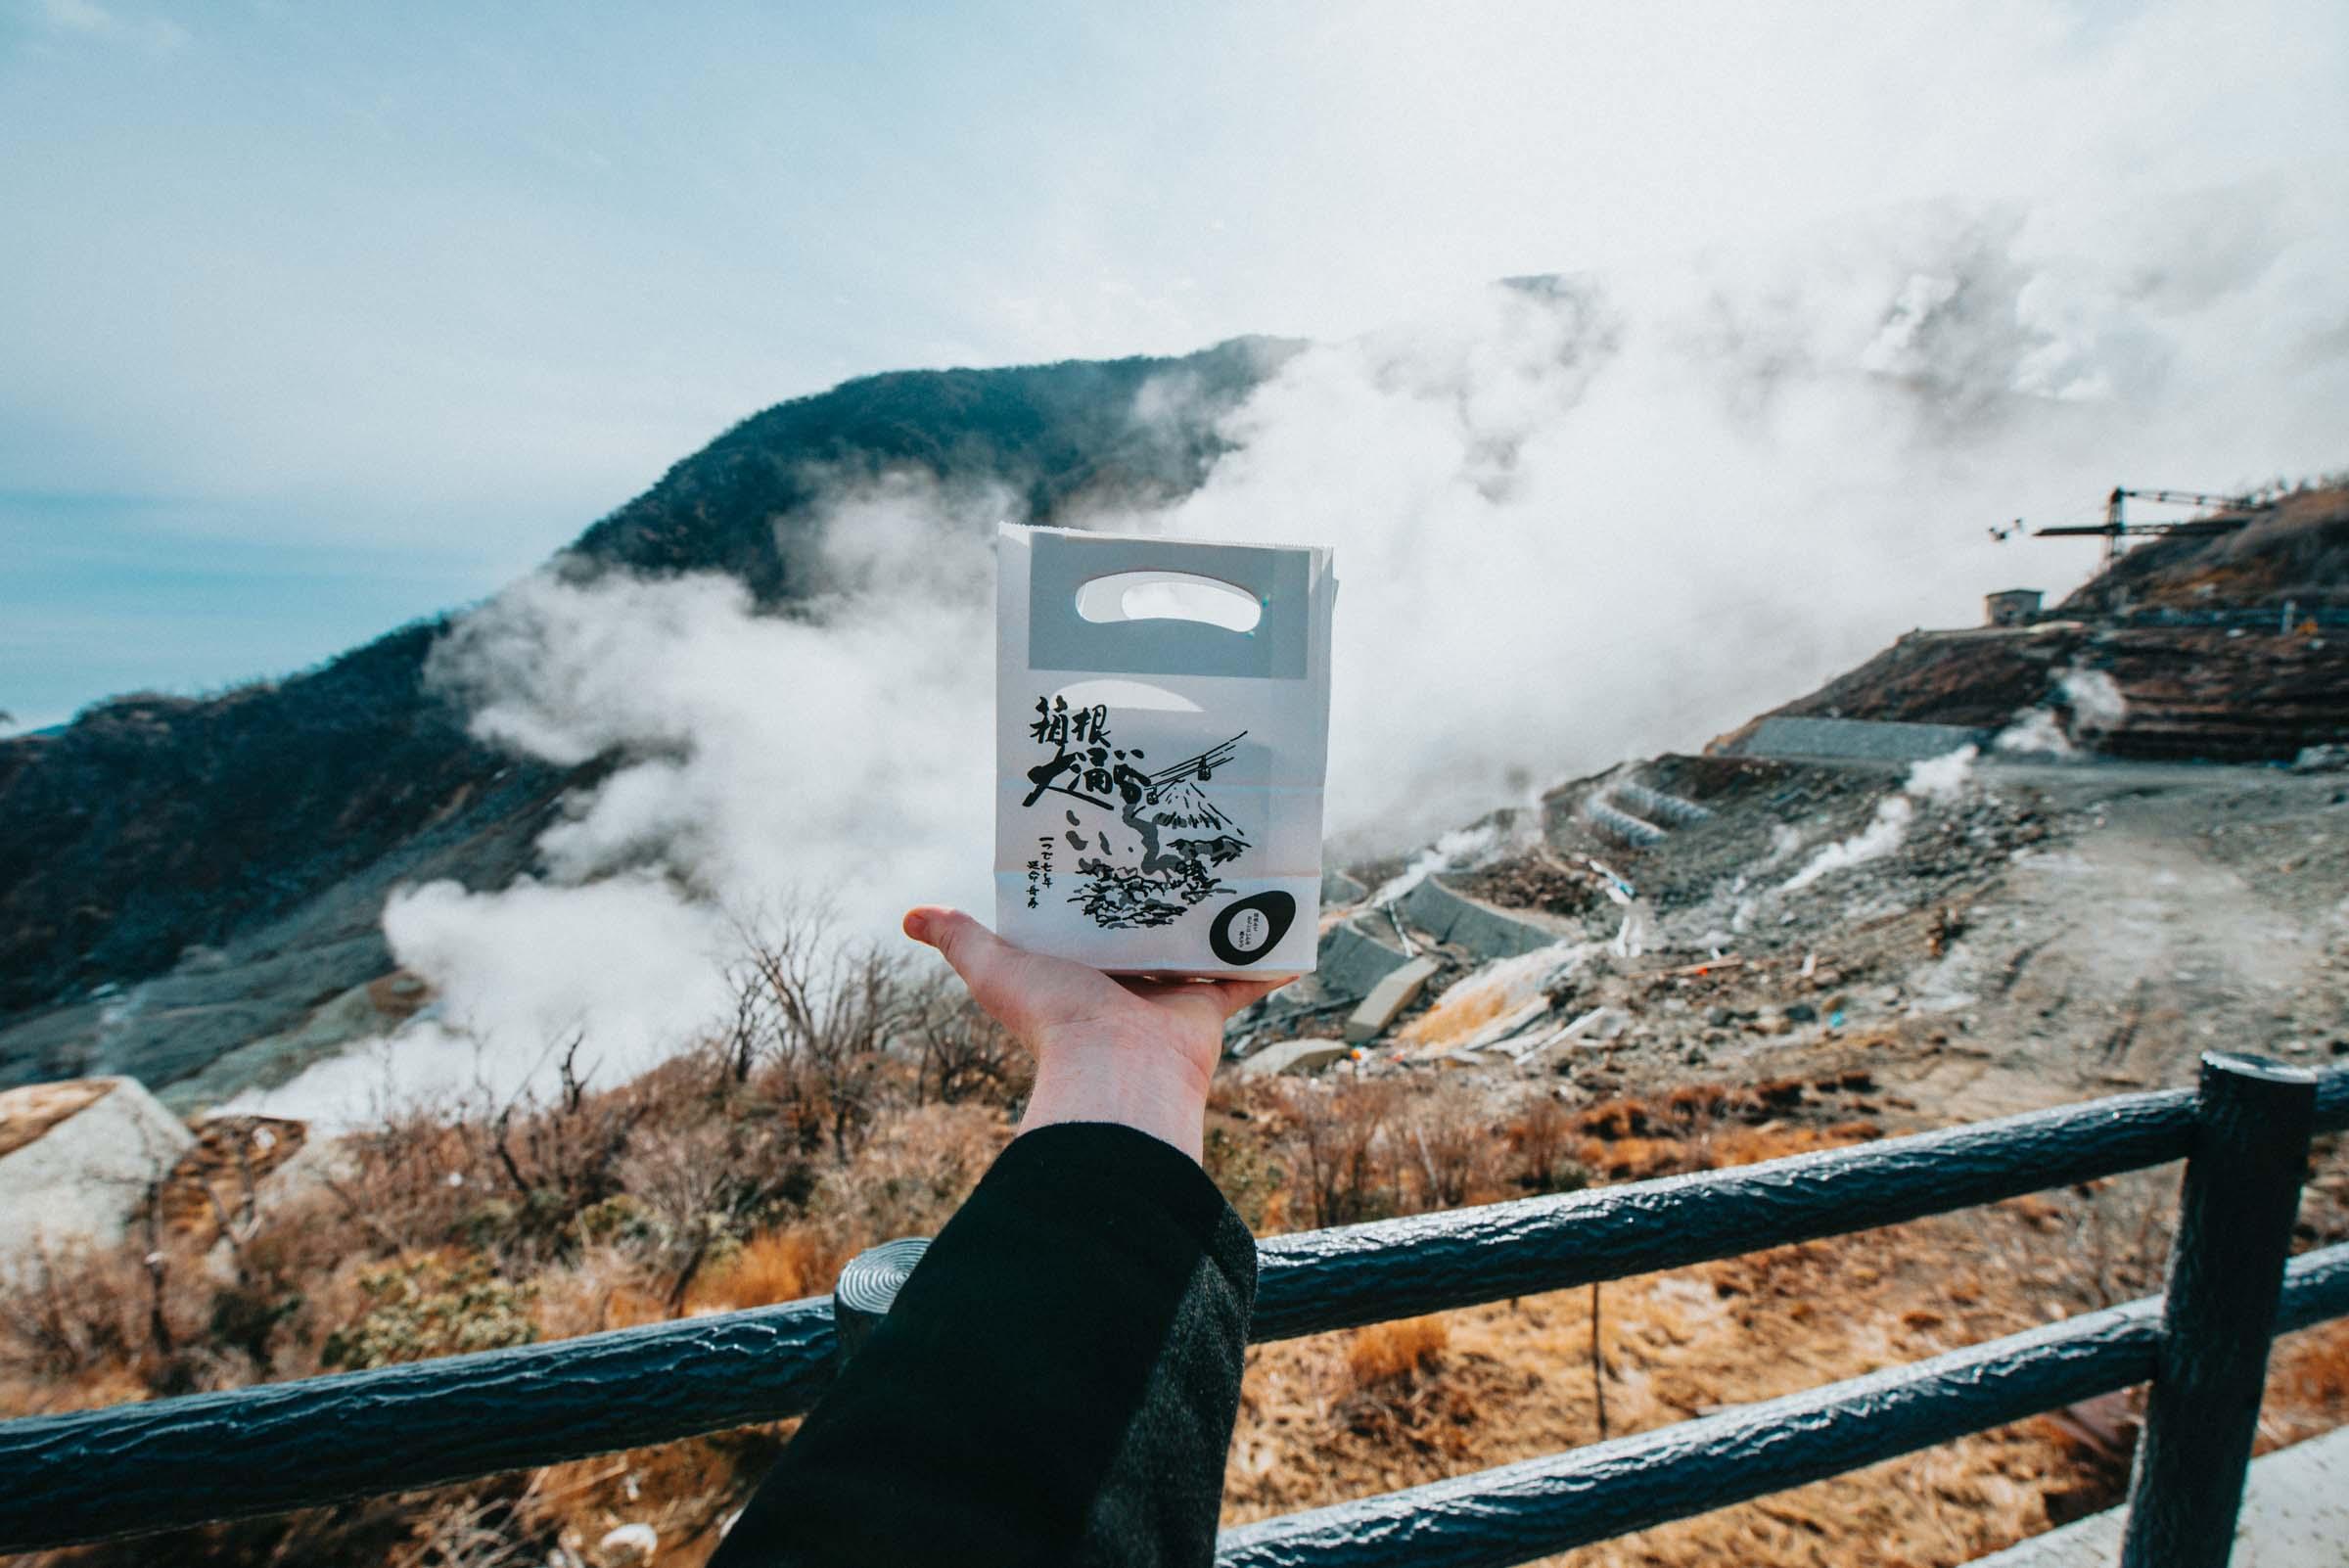 Black Egg - Hakone, Japan - Owakudani Valley